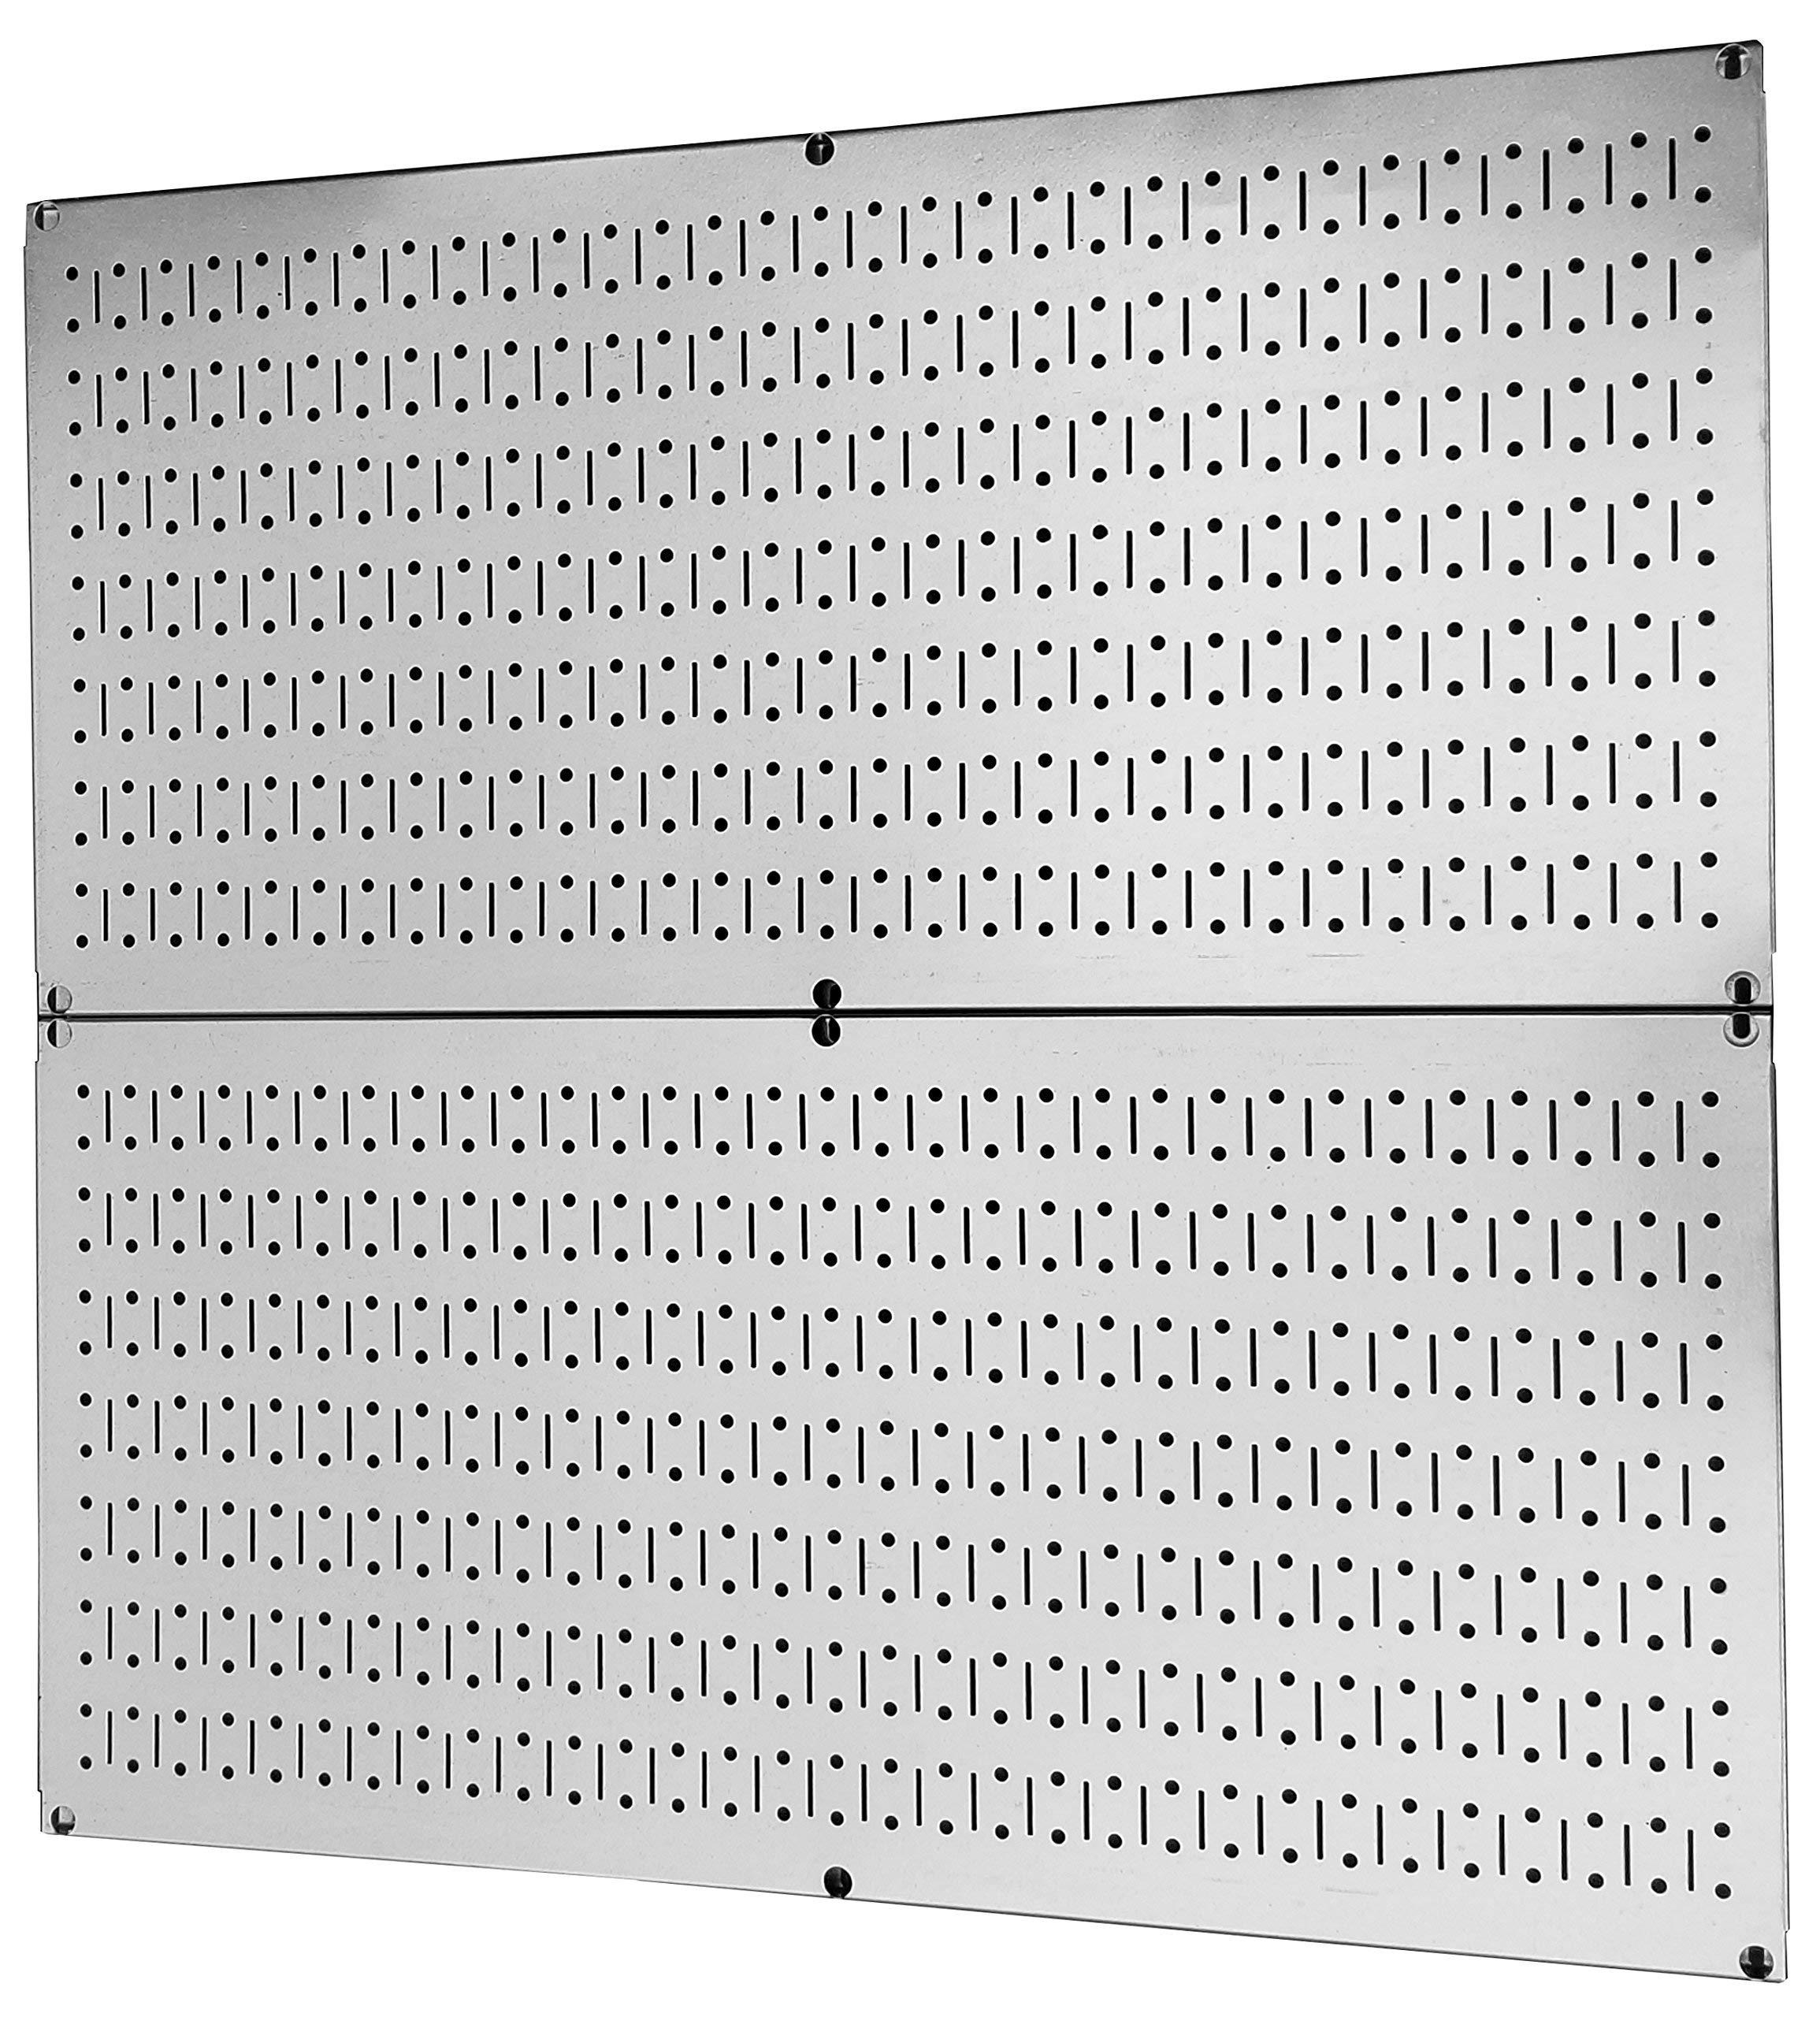 Pegboard Rack Wall Control Galvanized Steel Pegboard Pack - Two 32-Inch x 16-Inch Shiny Metallic Metal Pegboard Panels (Renewed)